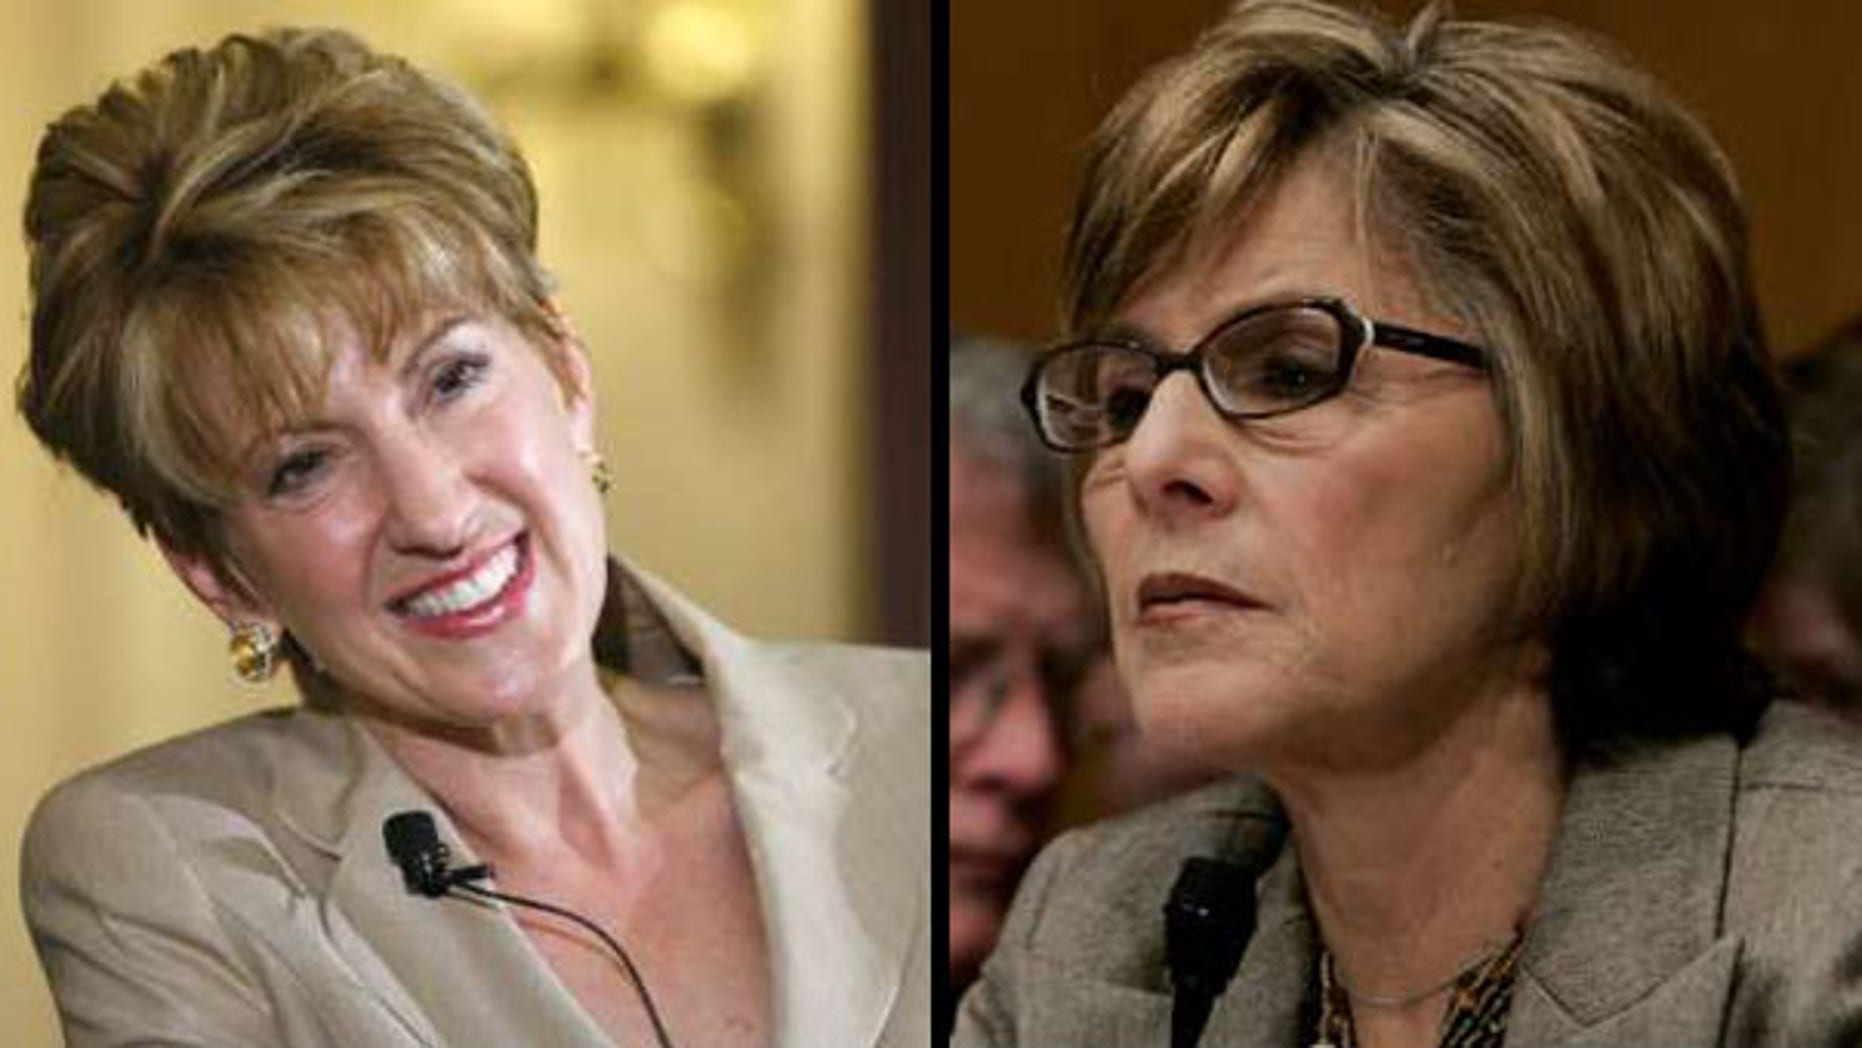 Former Hewlett-Packard CEO Carly Fiorina and Sen. Barbara Boxer are facing off in the U.S. Senate race in California